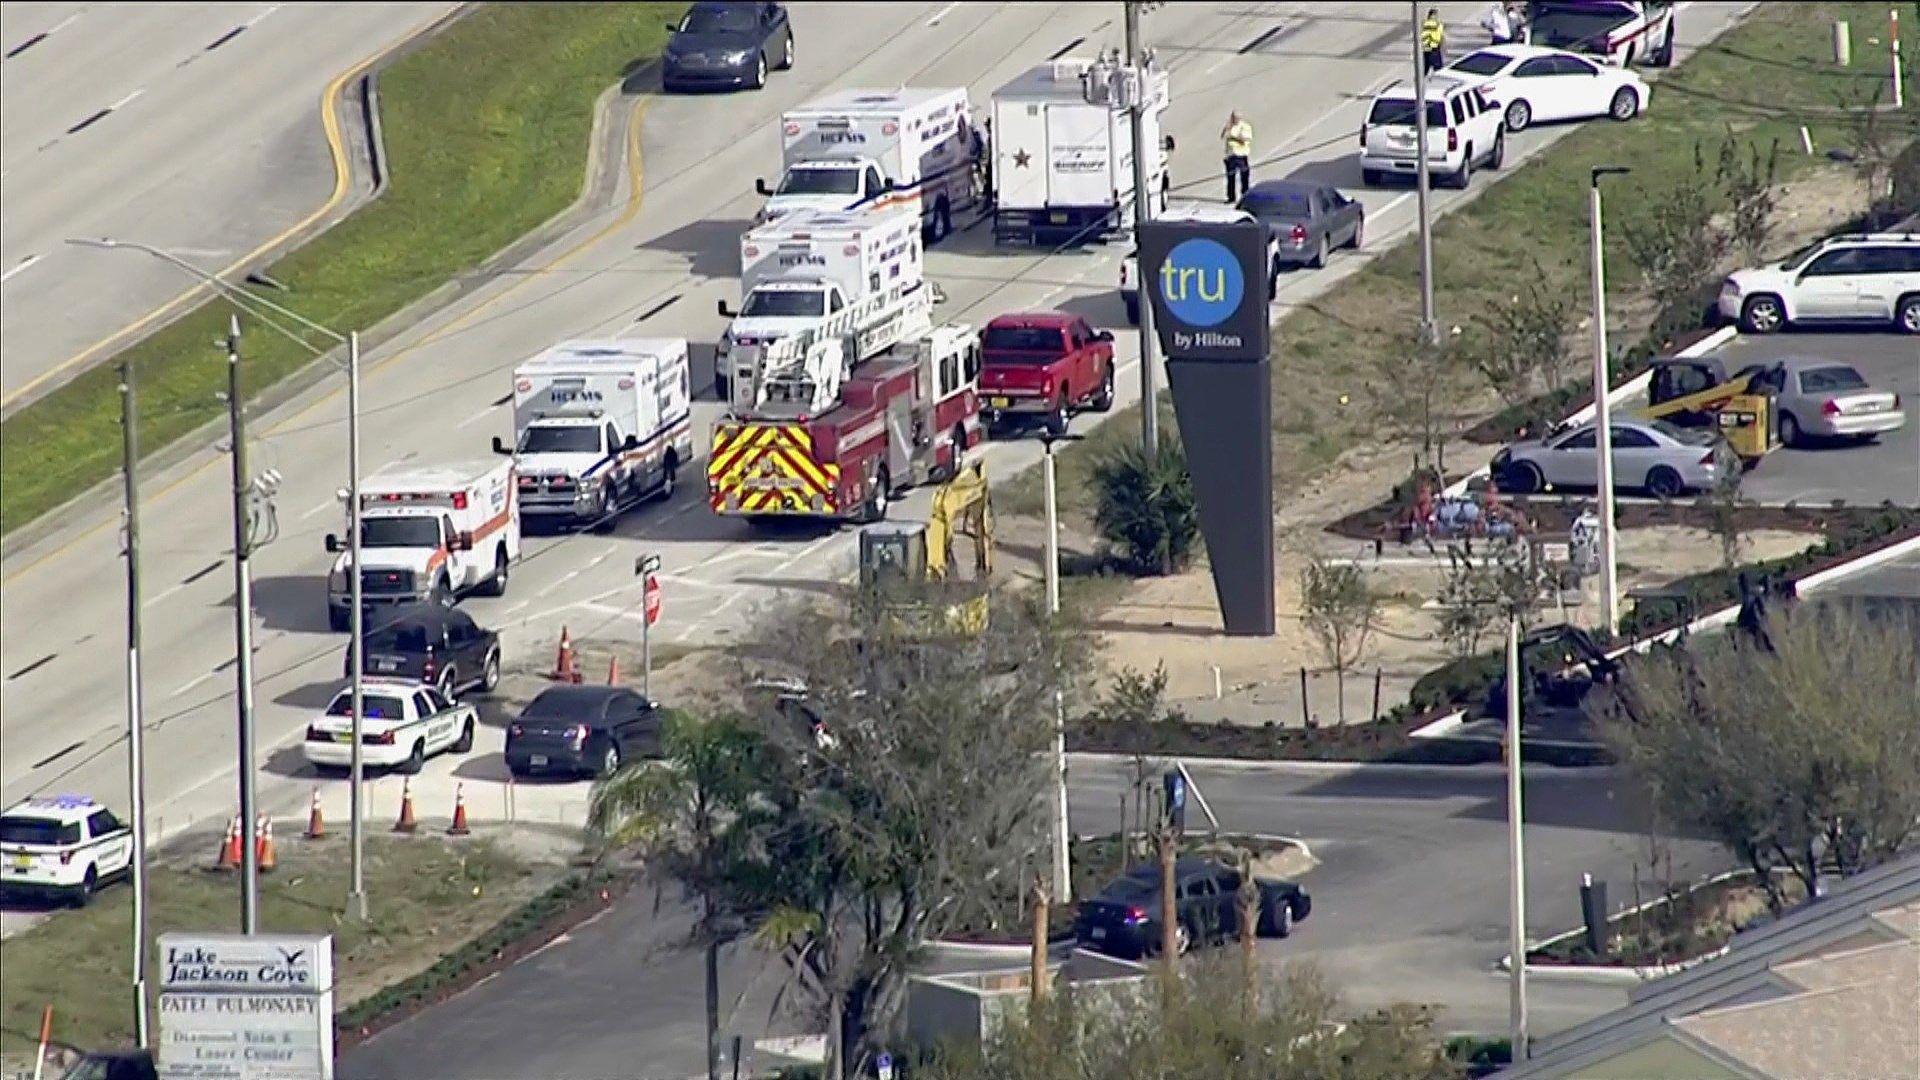 Five people shot dead at SunTrust Bank in Florida, suspect